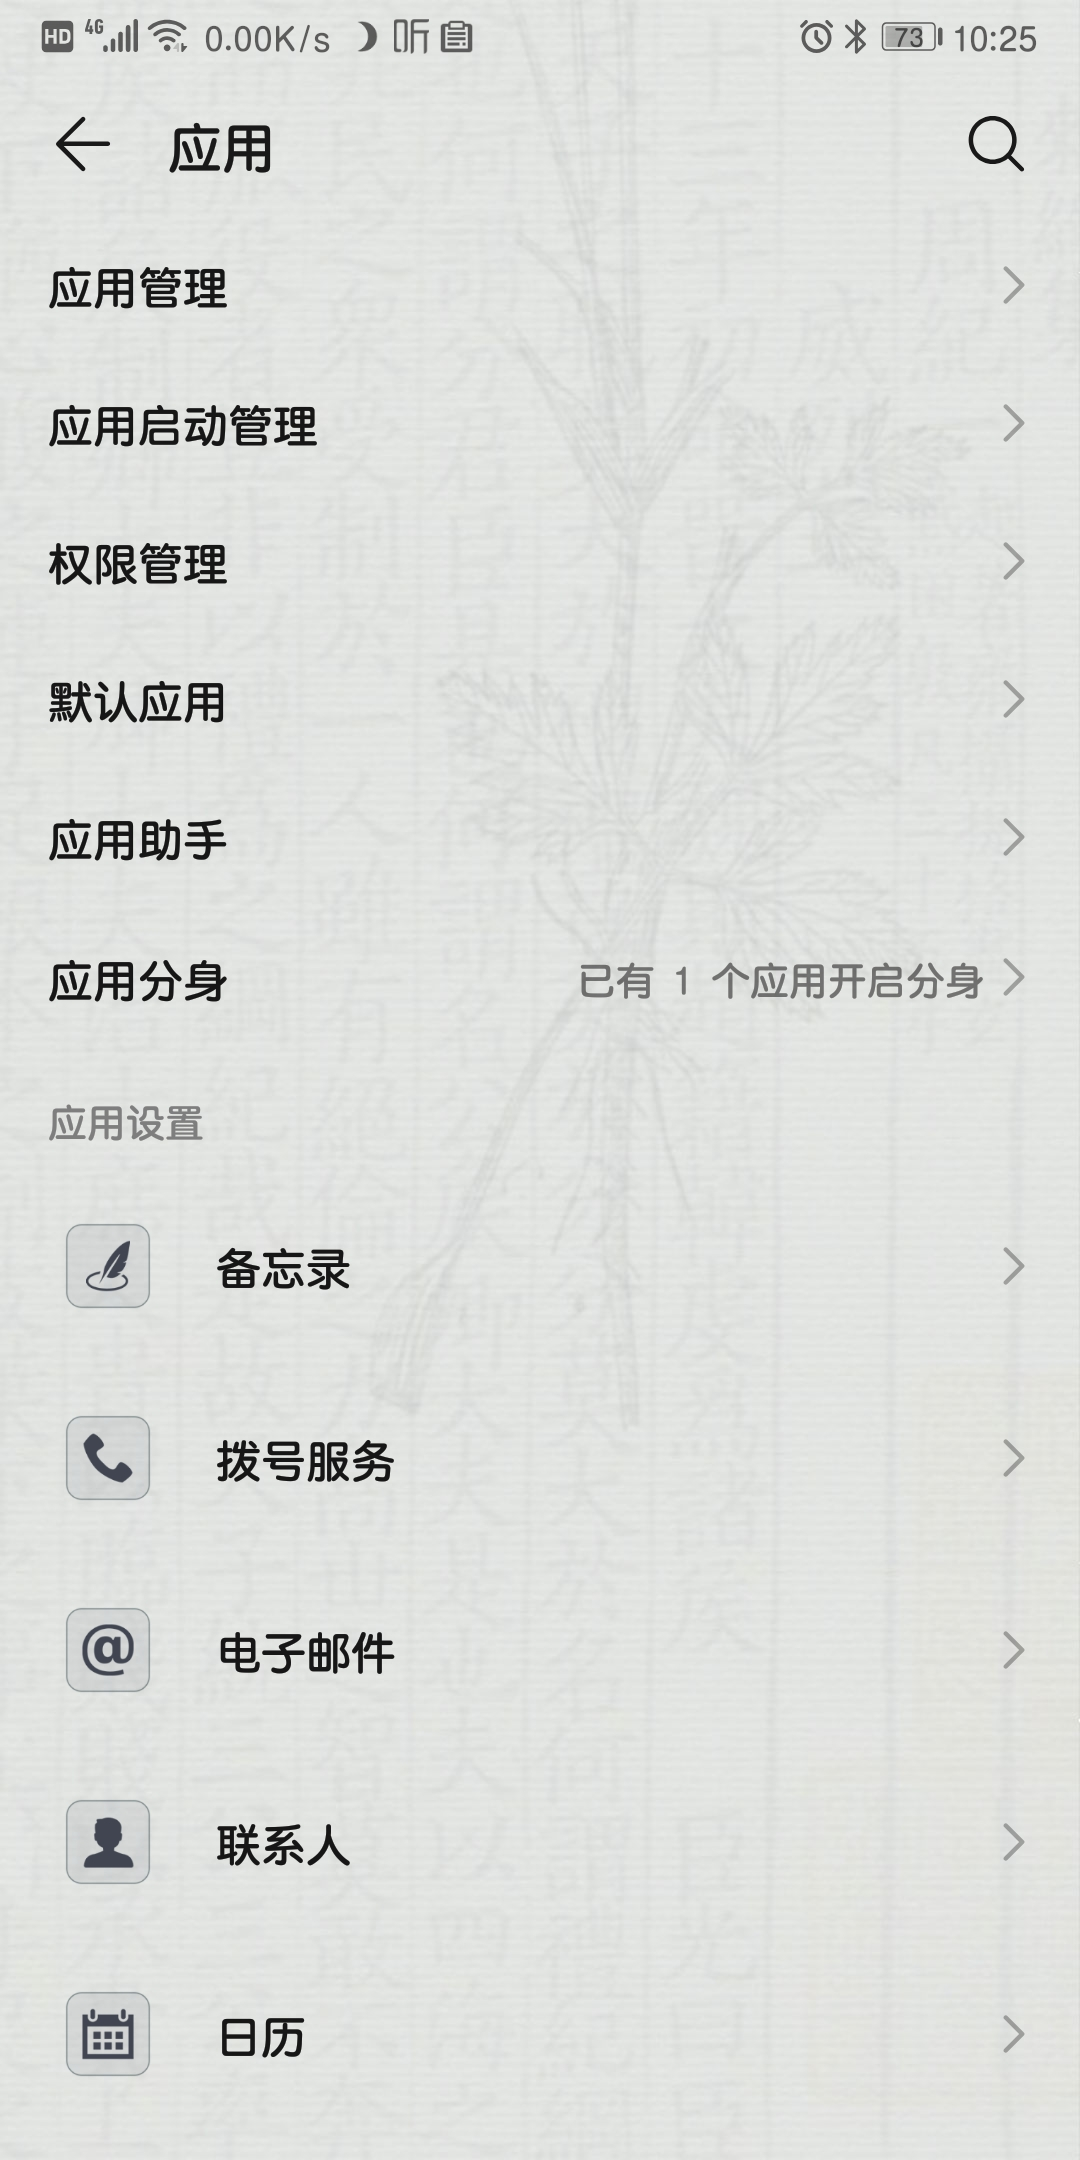 Screenshot_20191111_102545_com.android.settings.jpg